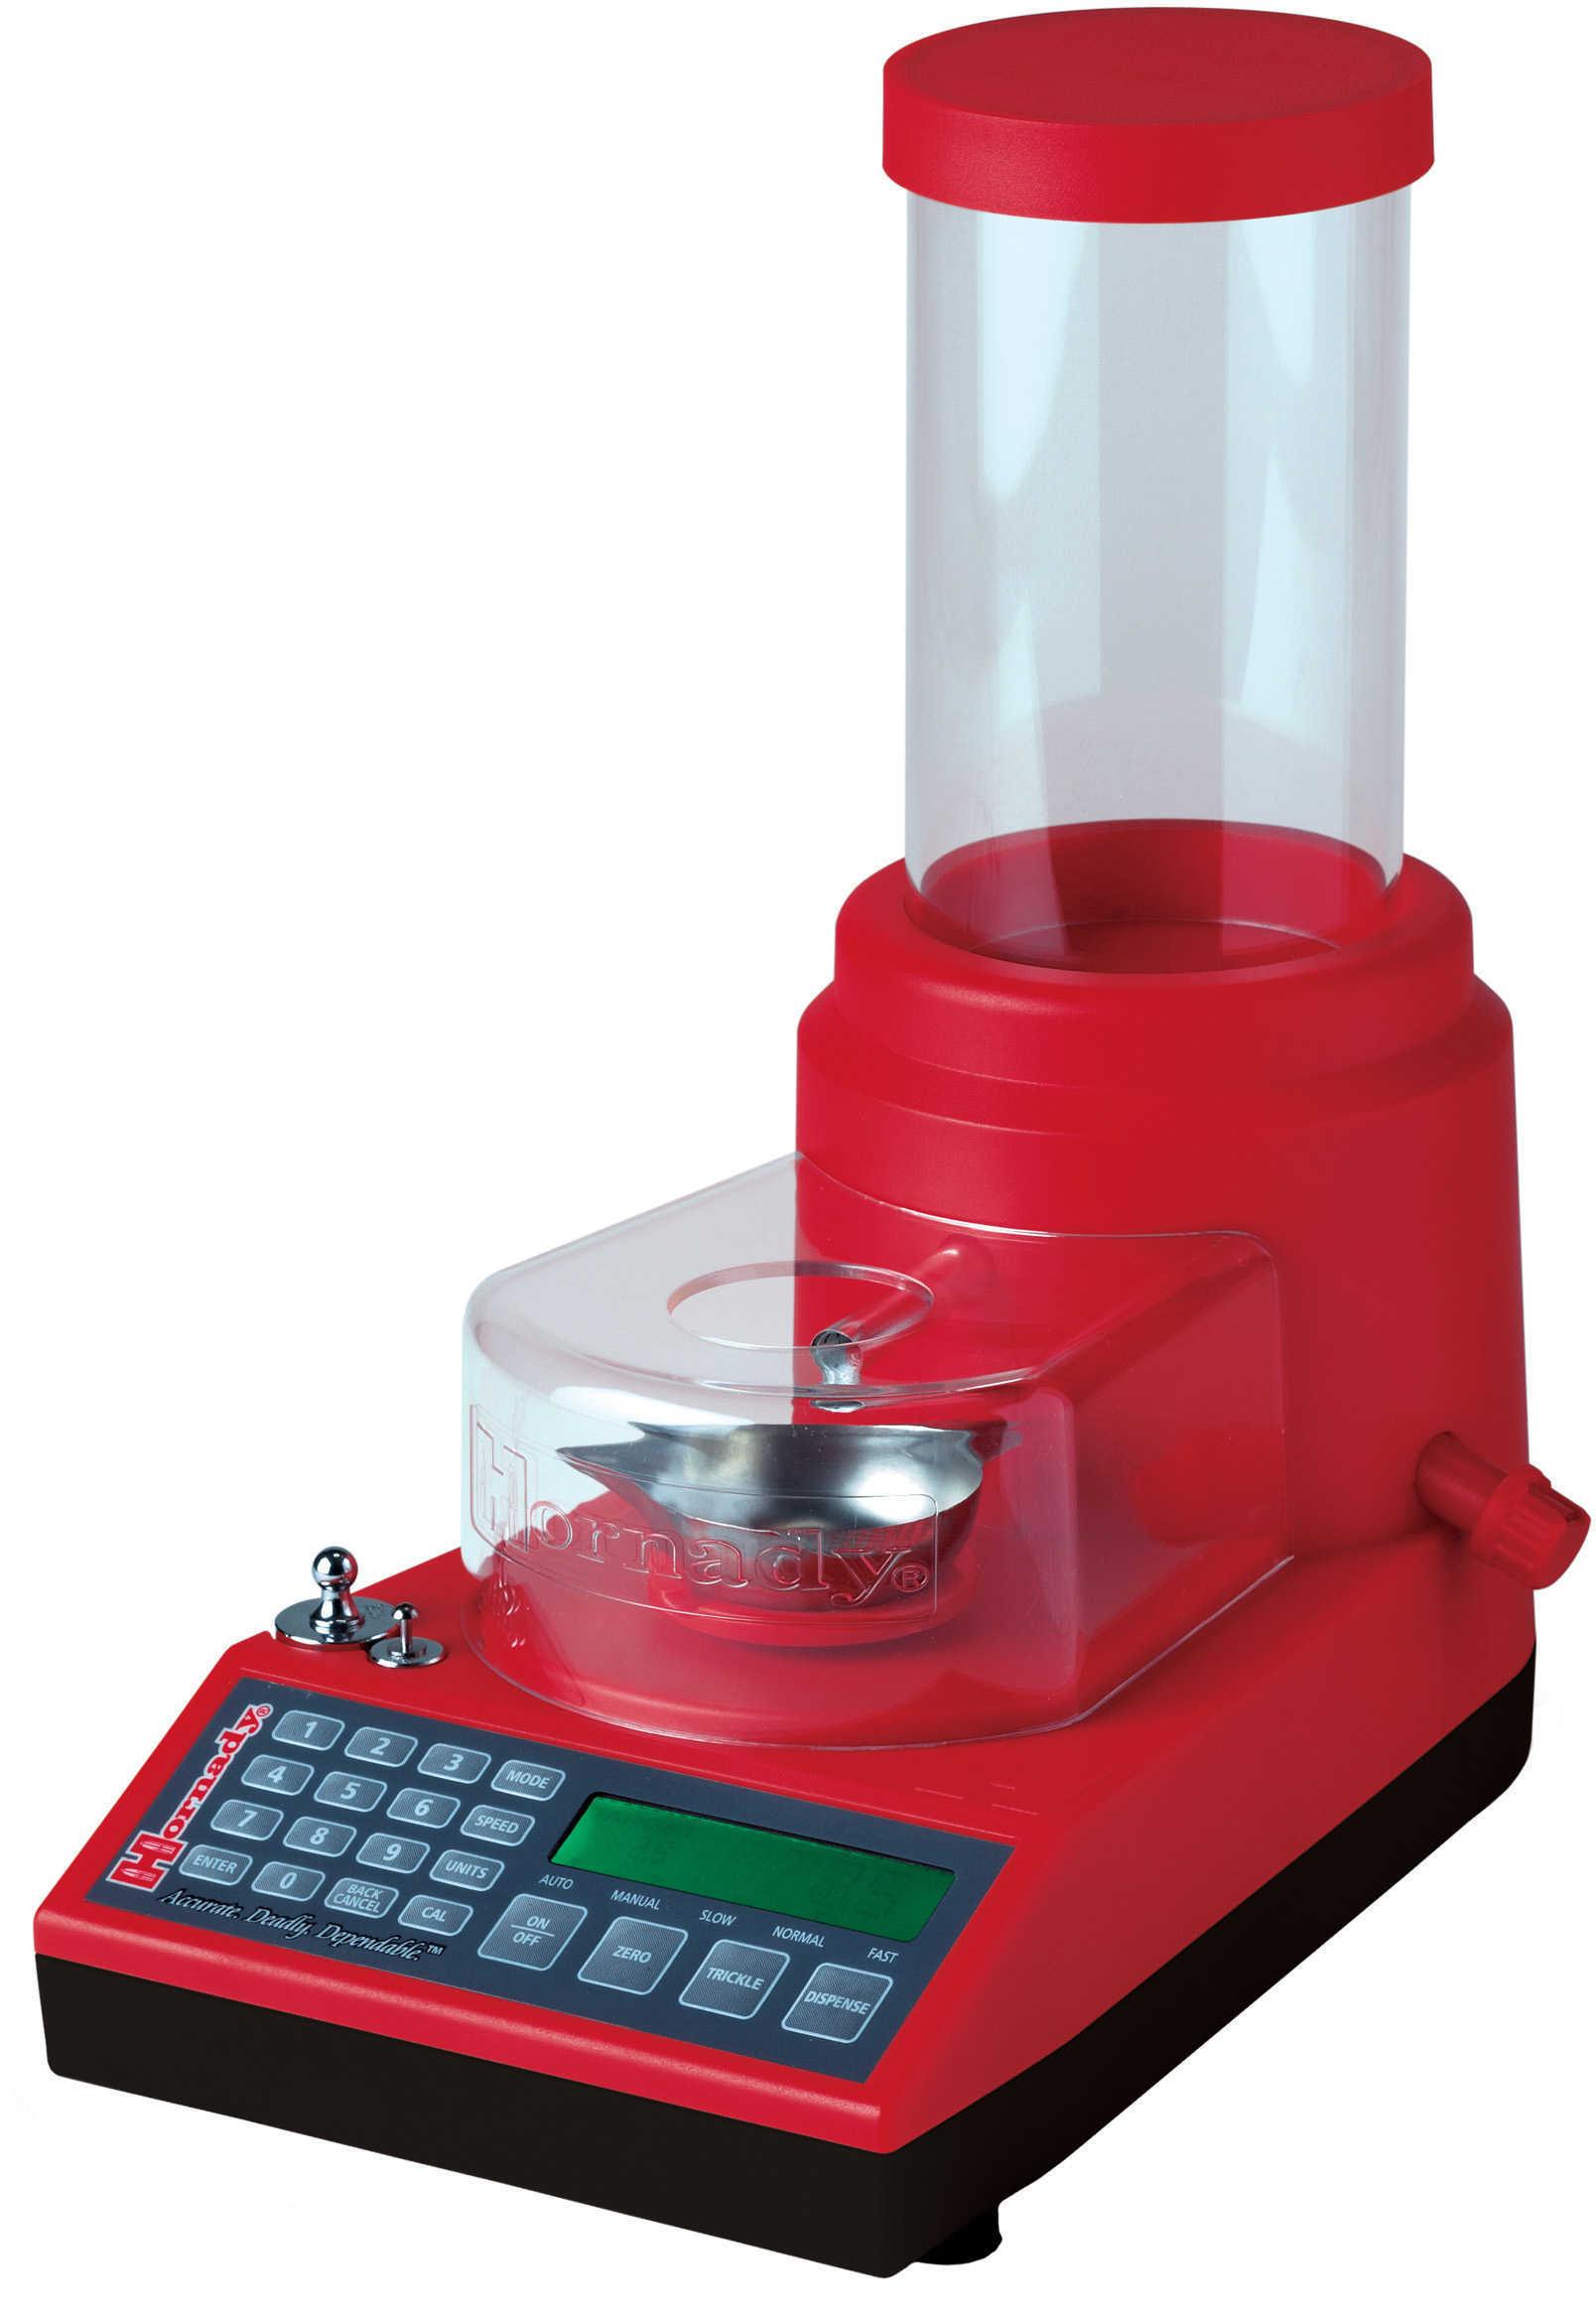 Hornady Lock-N-Load Auto Charge Powder Dispenser Md: 050068